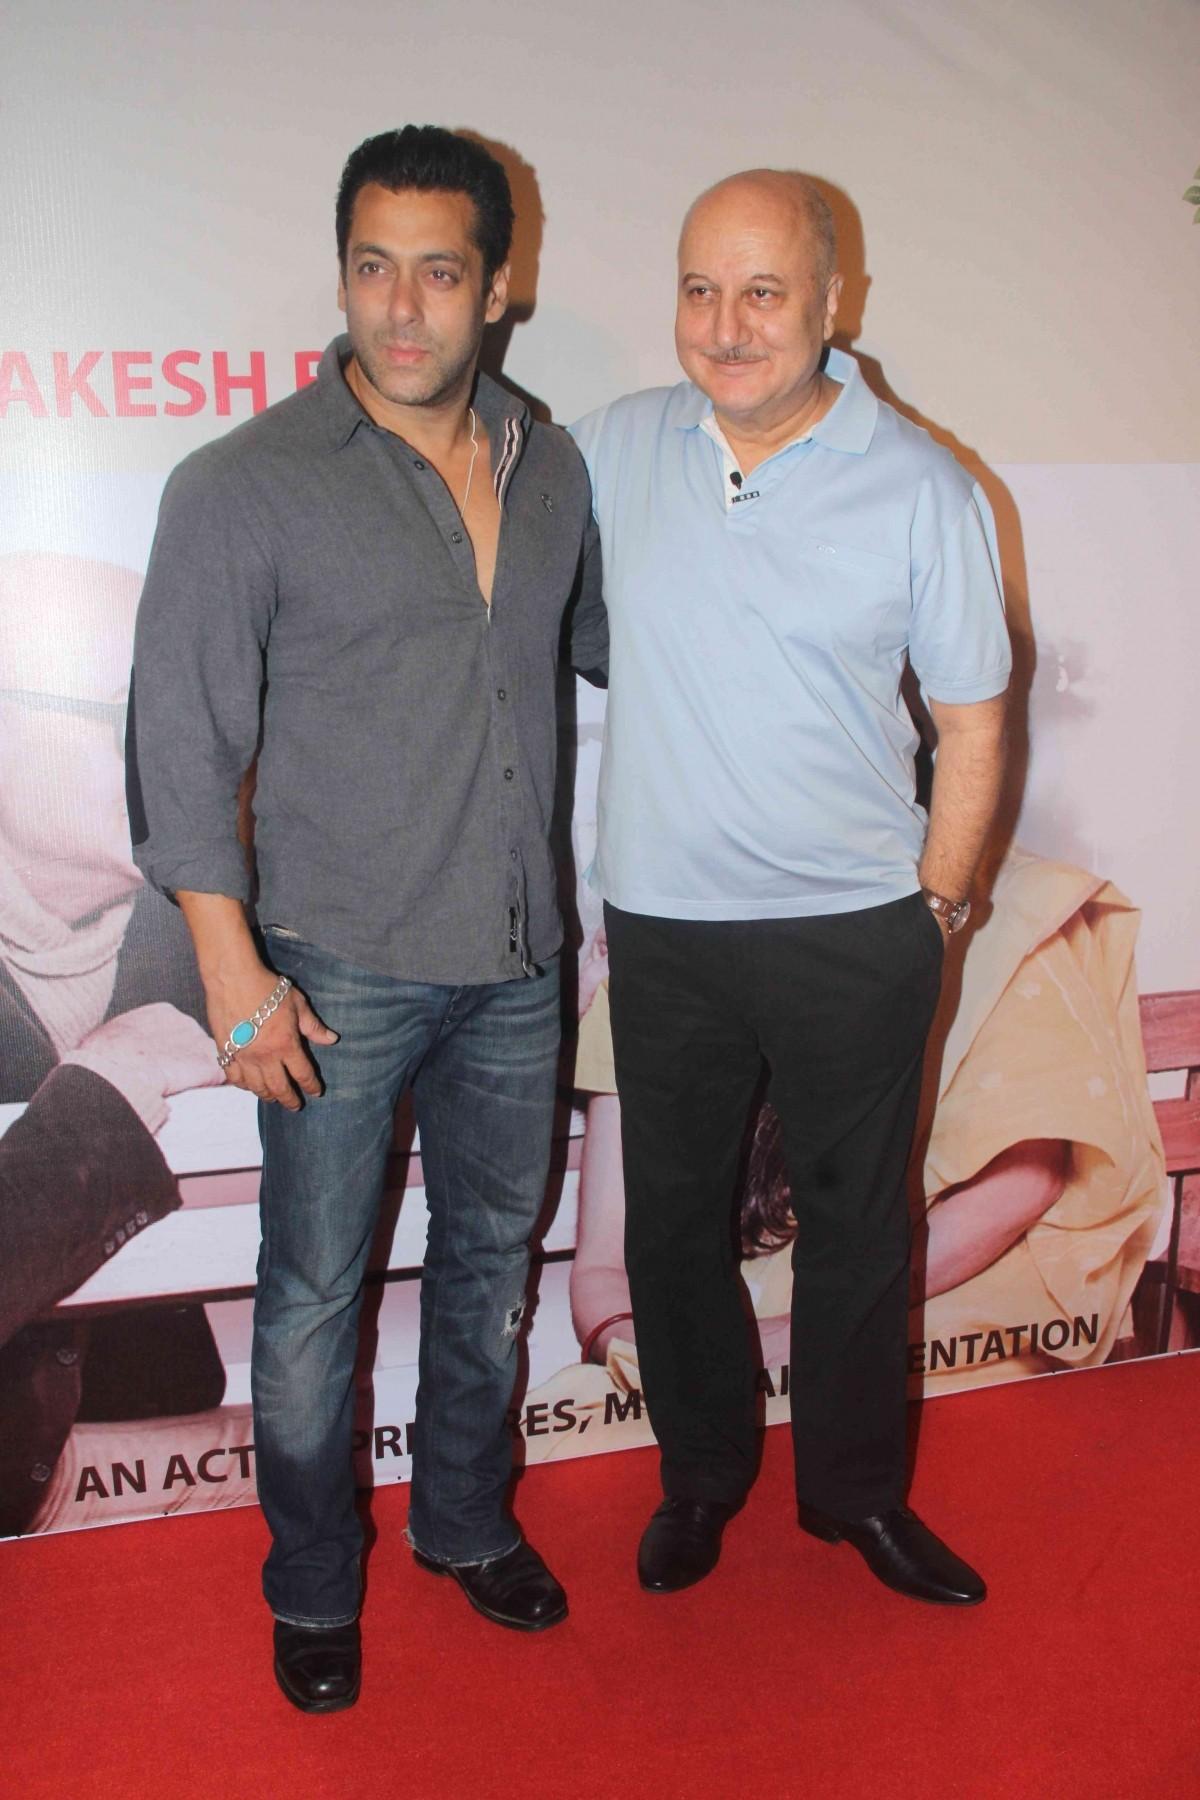 Salman Khan, Parineeti Chopra and Others Watch Anupam Kher's Play 'Mera Woh Matlab Nahi Tha'